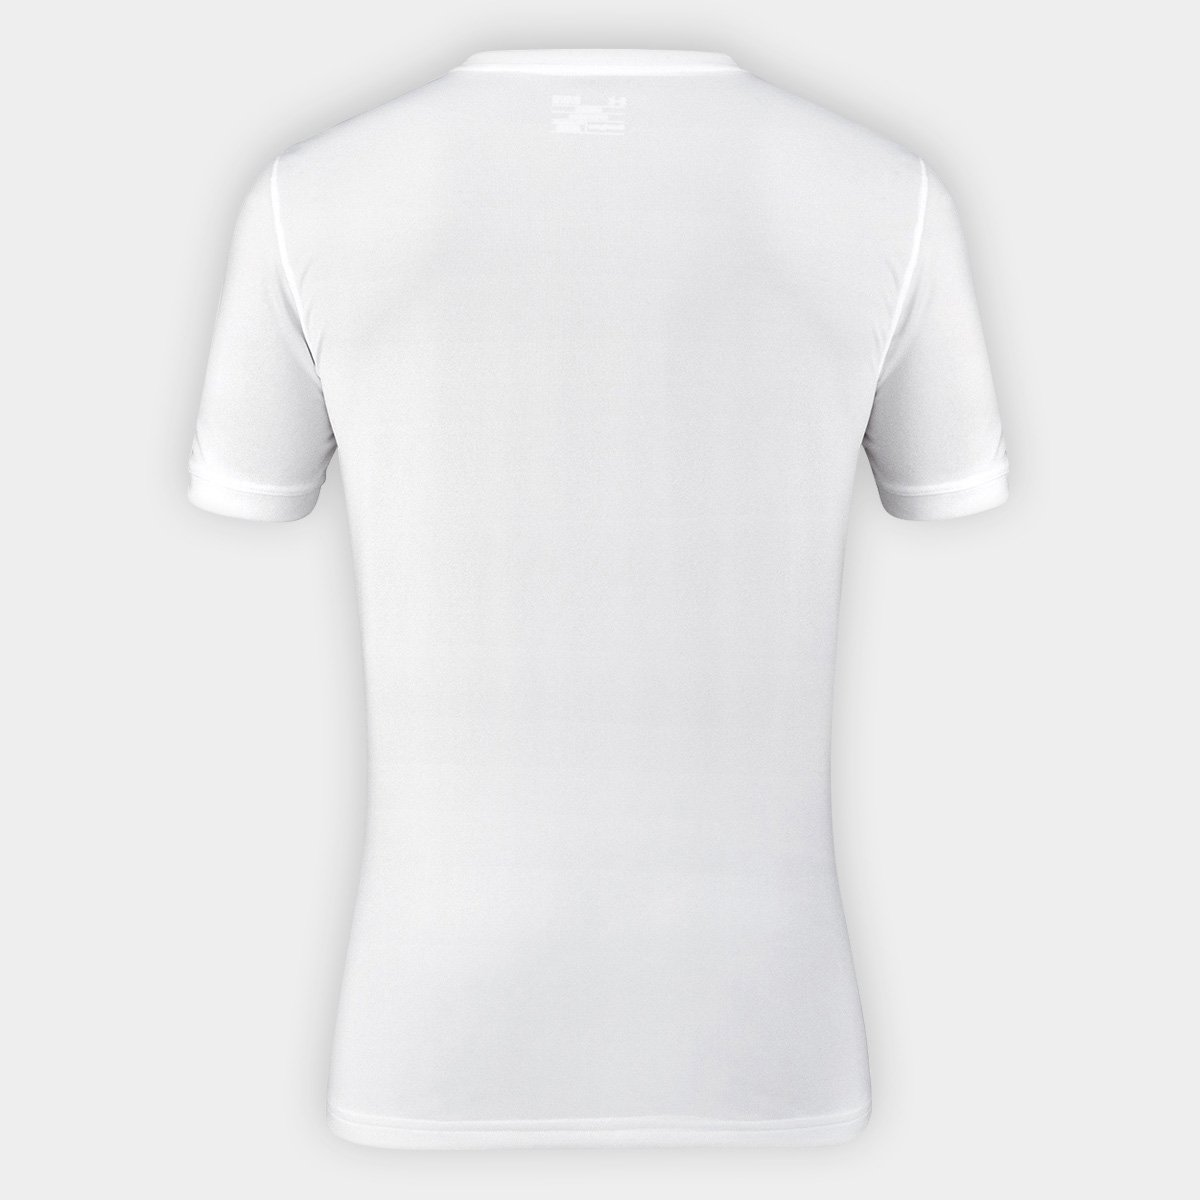 Camisa Fluminense II 17 18 s nº Torcedor Under Armour Masculina ... 1a492e6aa4fb1